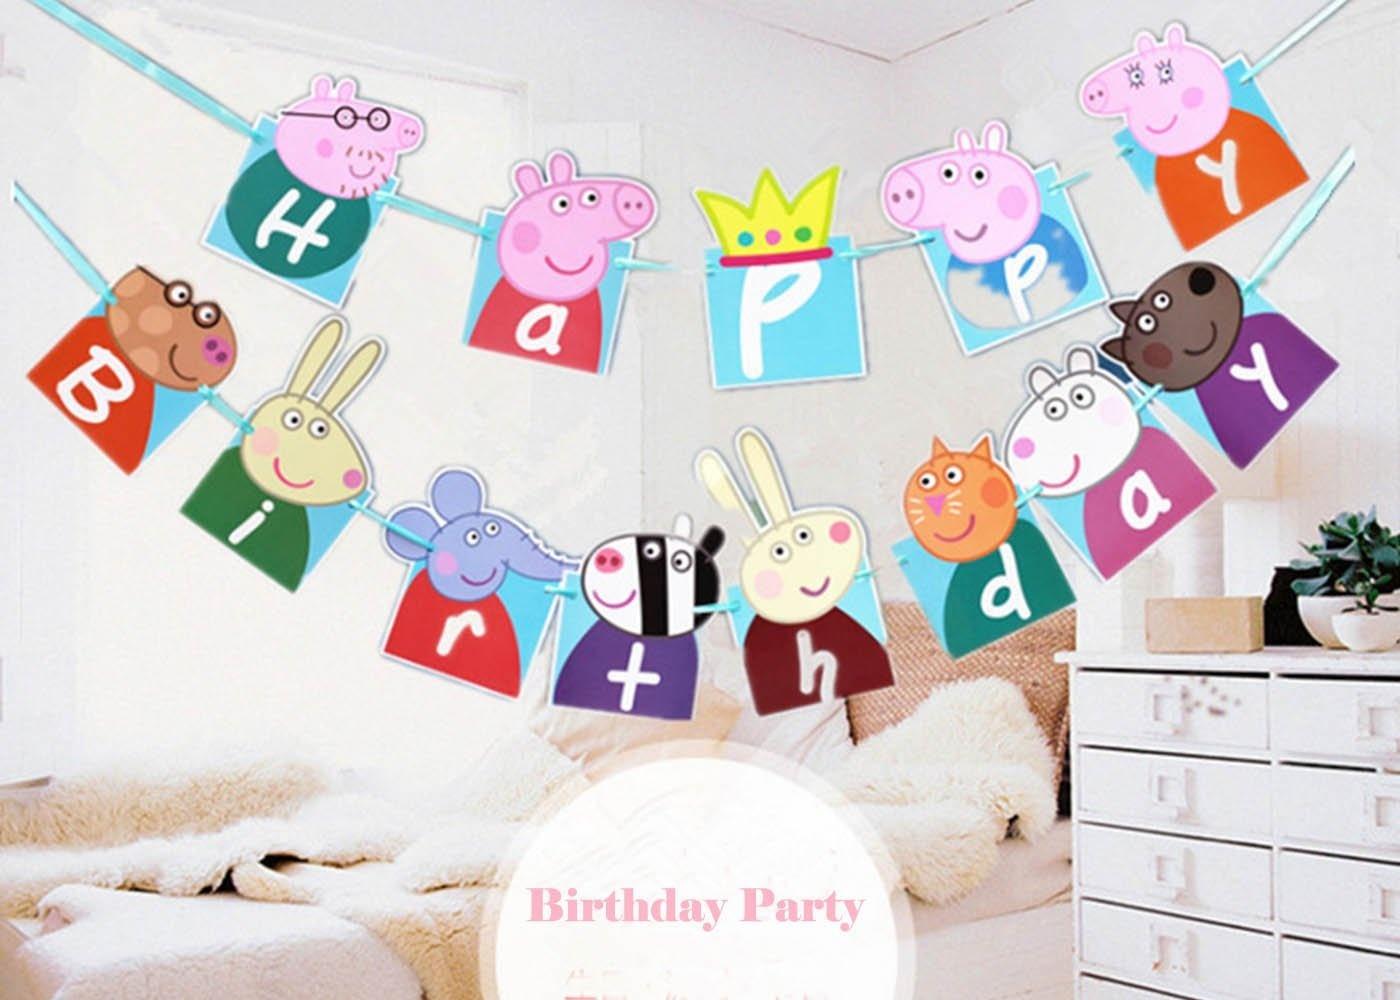 Buy Efivs Arts Cute Peppa Pig Theme Party Decorative Happy Birthday - Peppa Pig Birthday Banner Printable Free